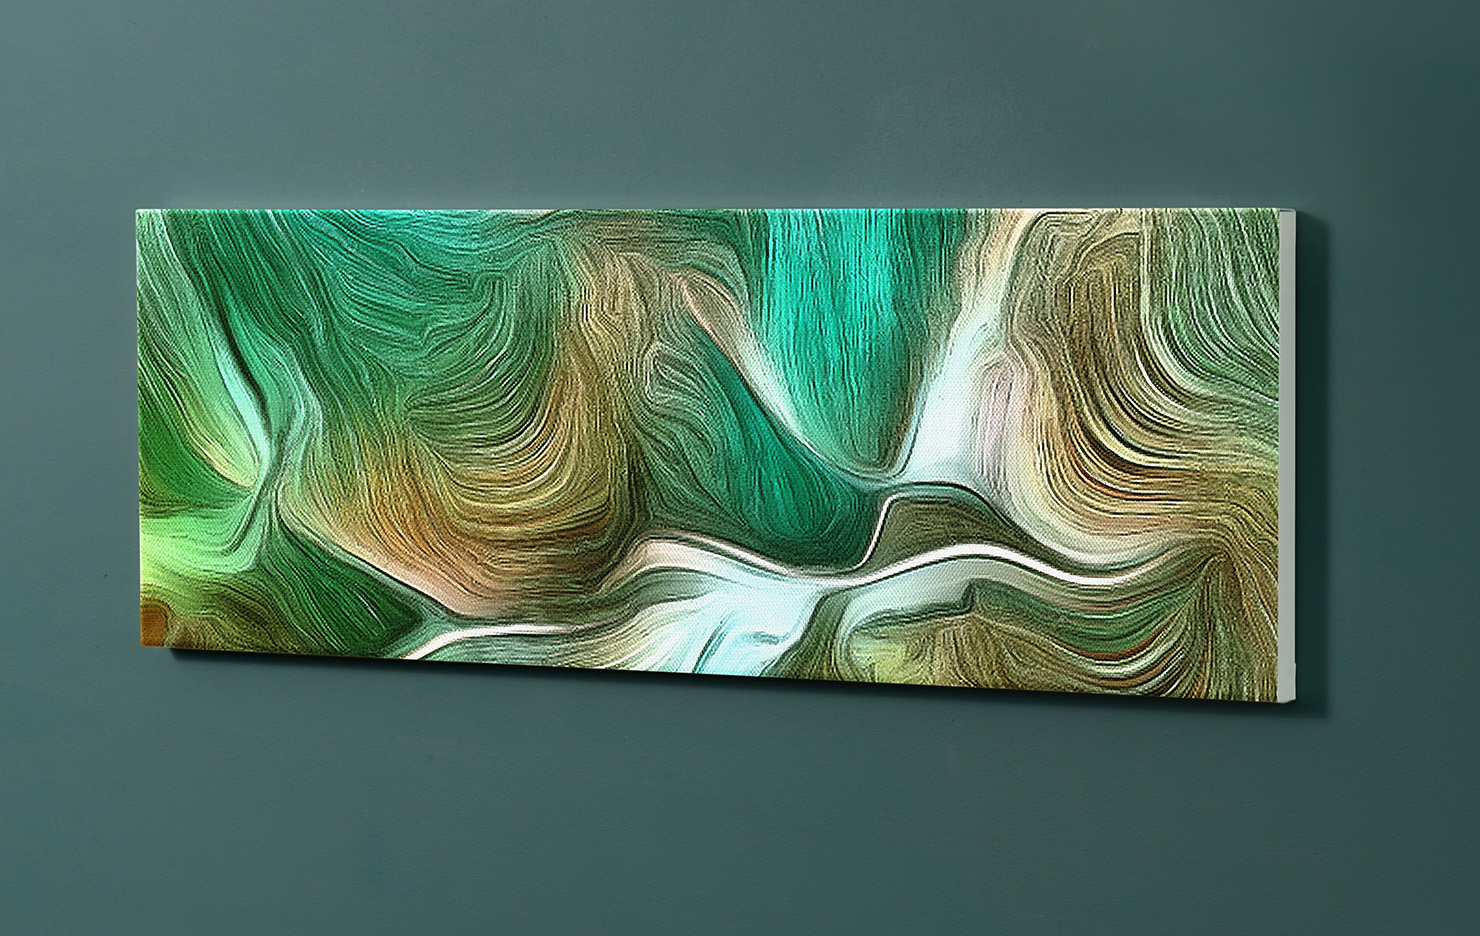 Magnettafel NOTIZ 90x30cm Motiv-Pinnwand M106 Abstrakt Kunst